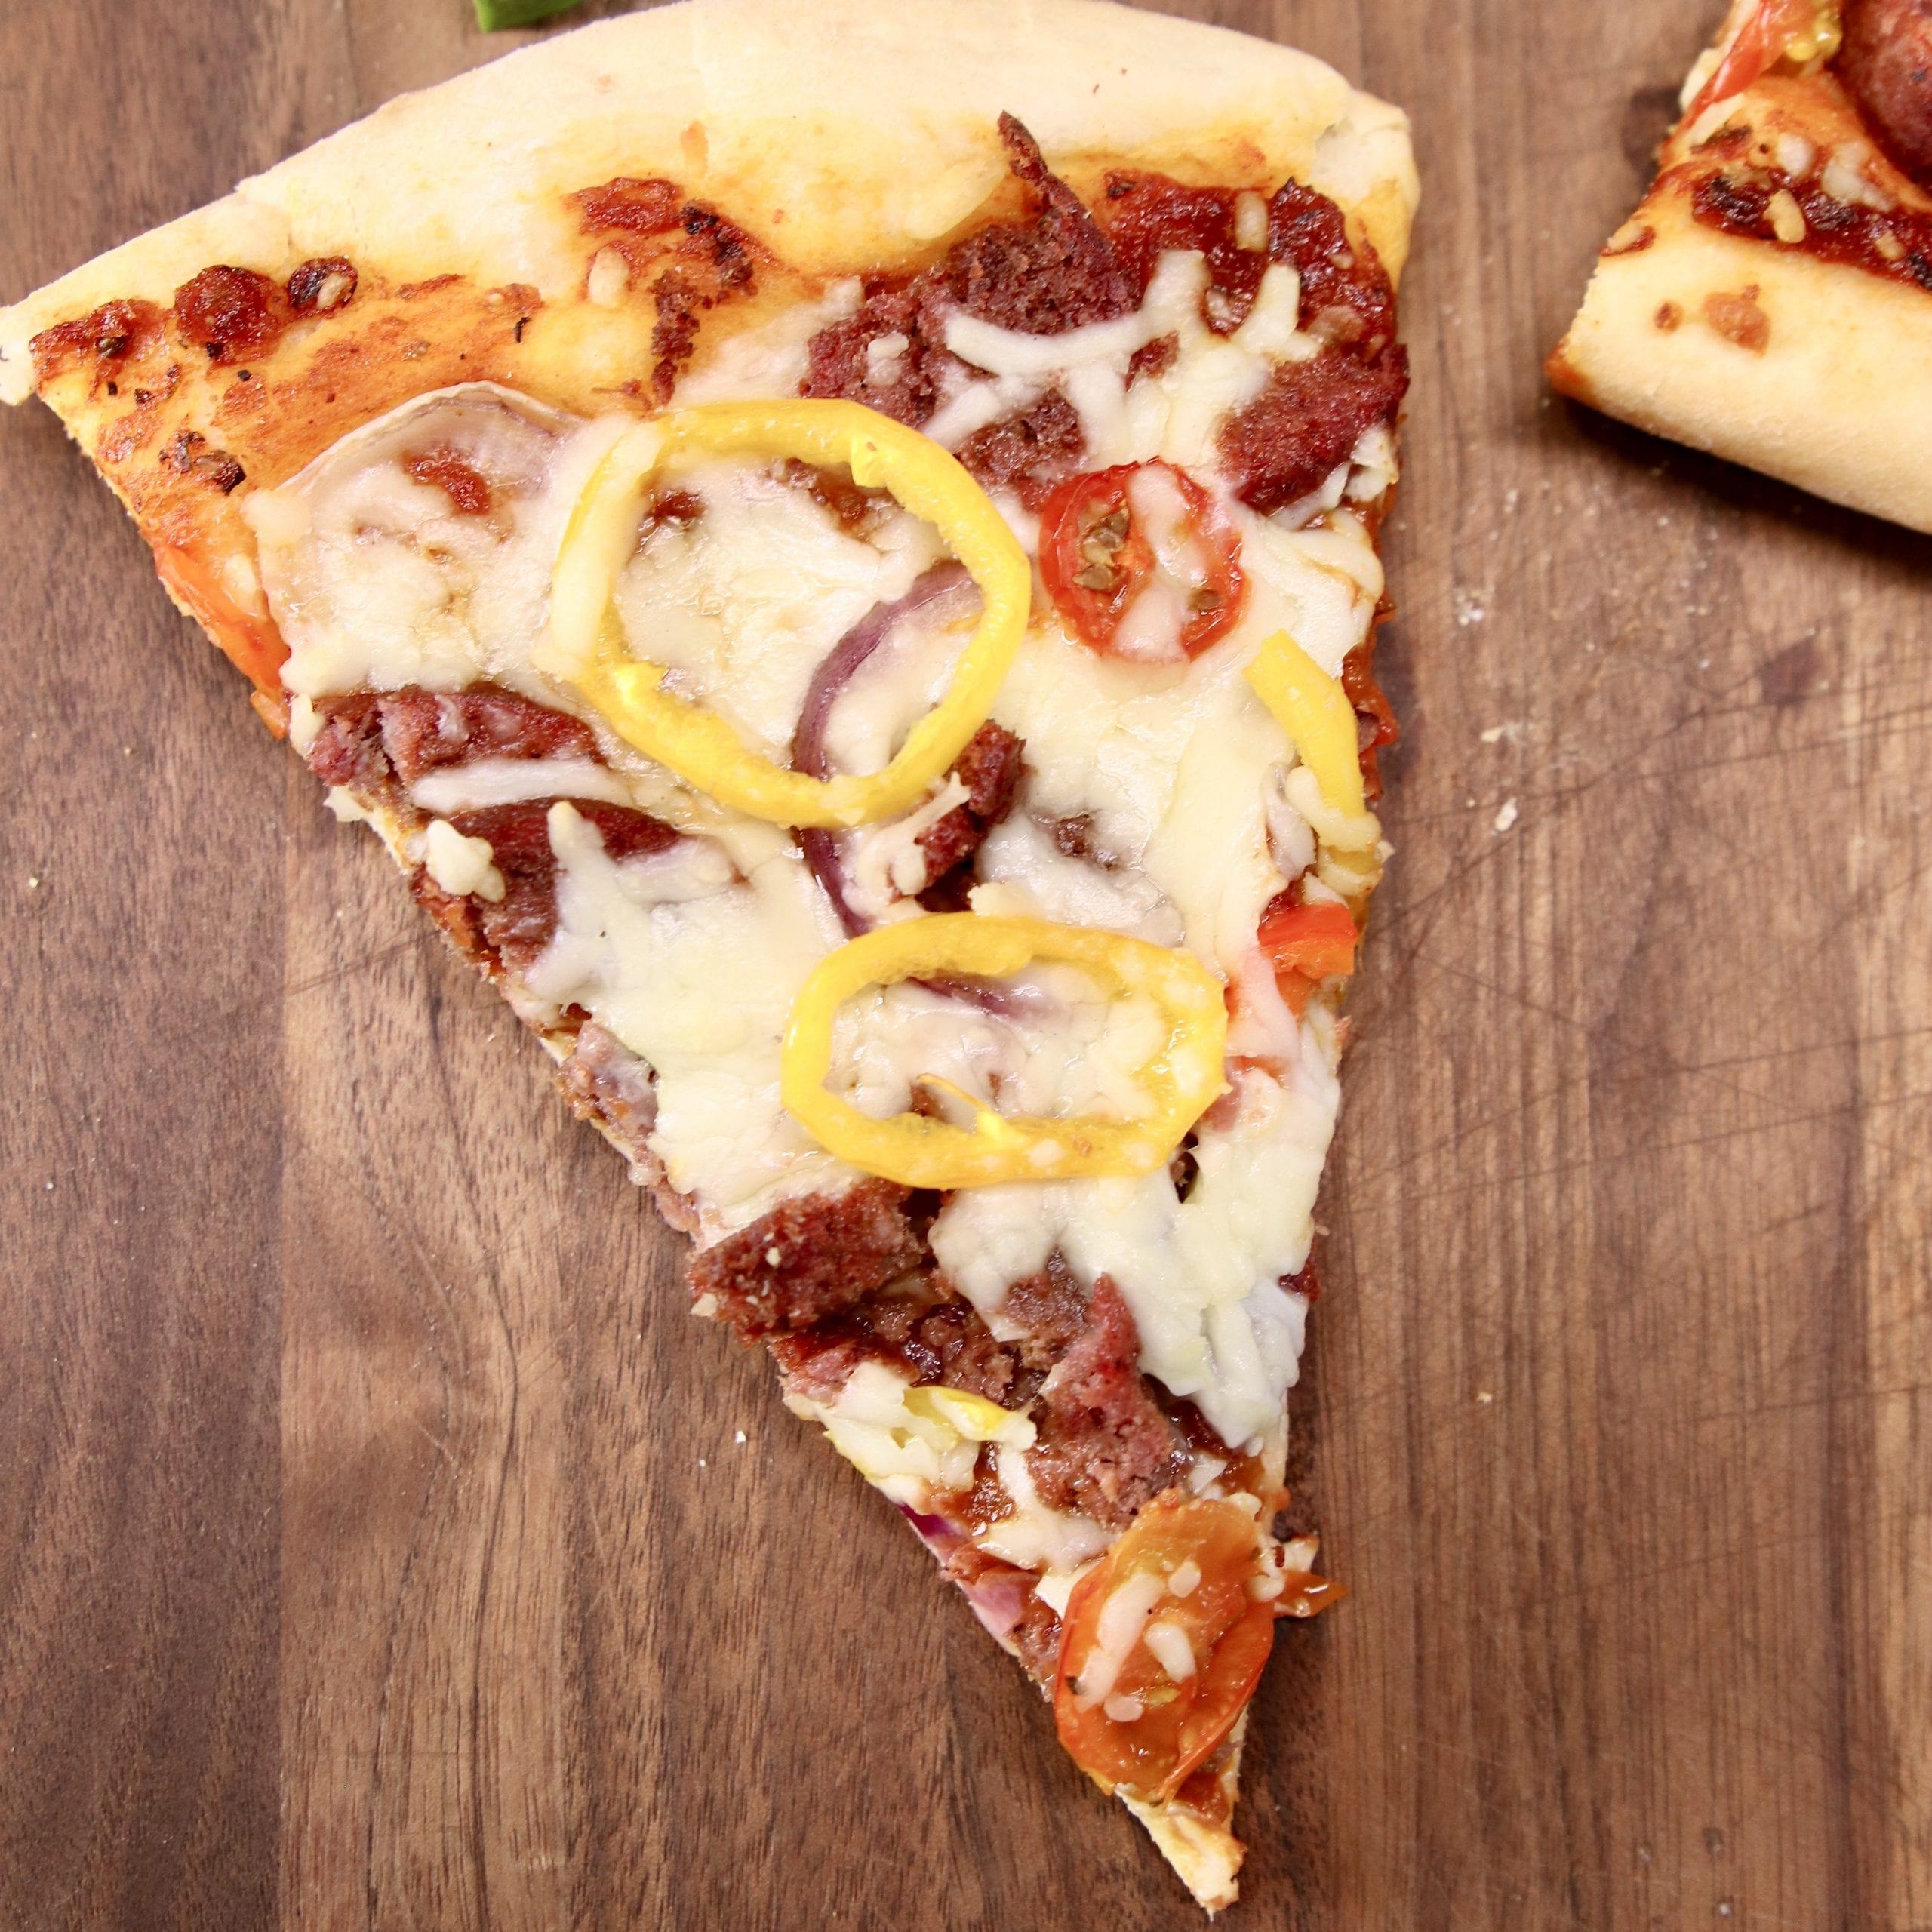 slice of pizza on a walnut cutting board